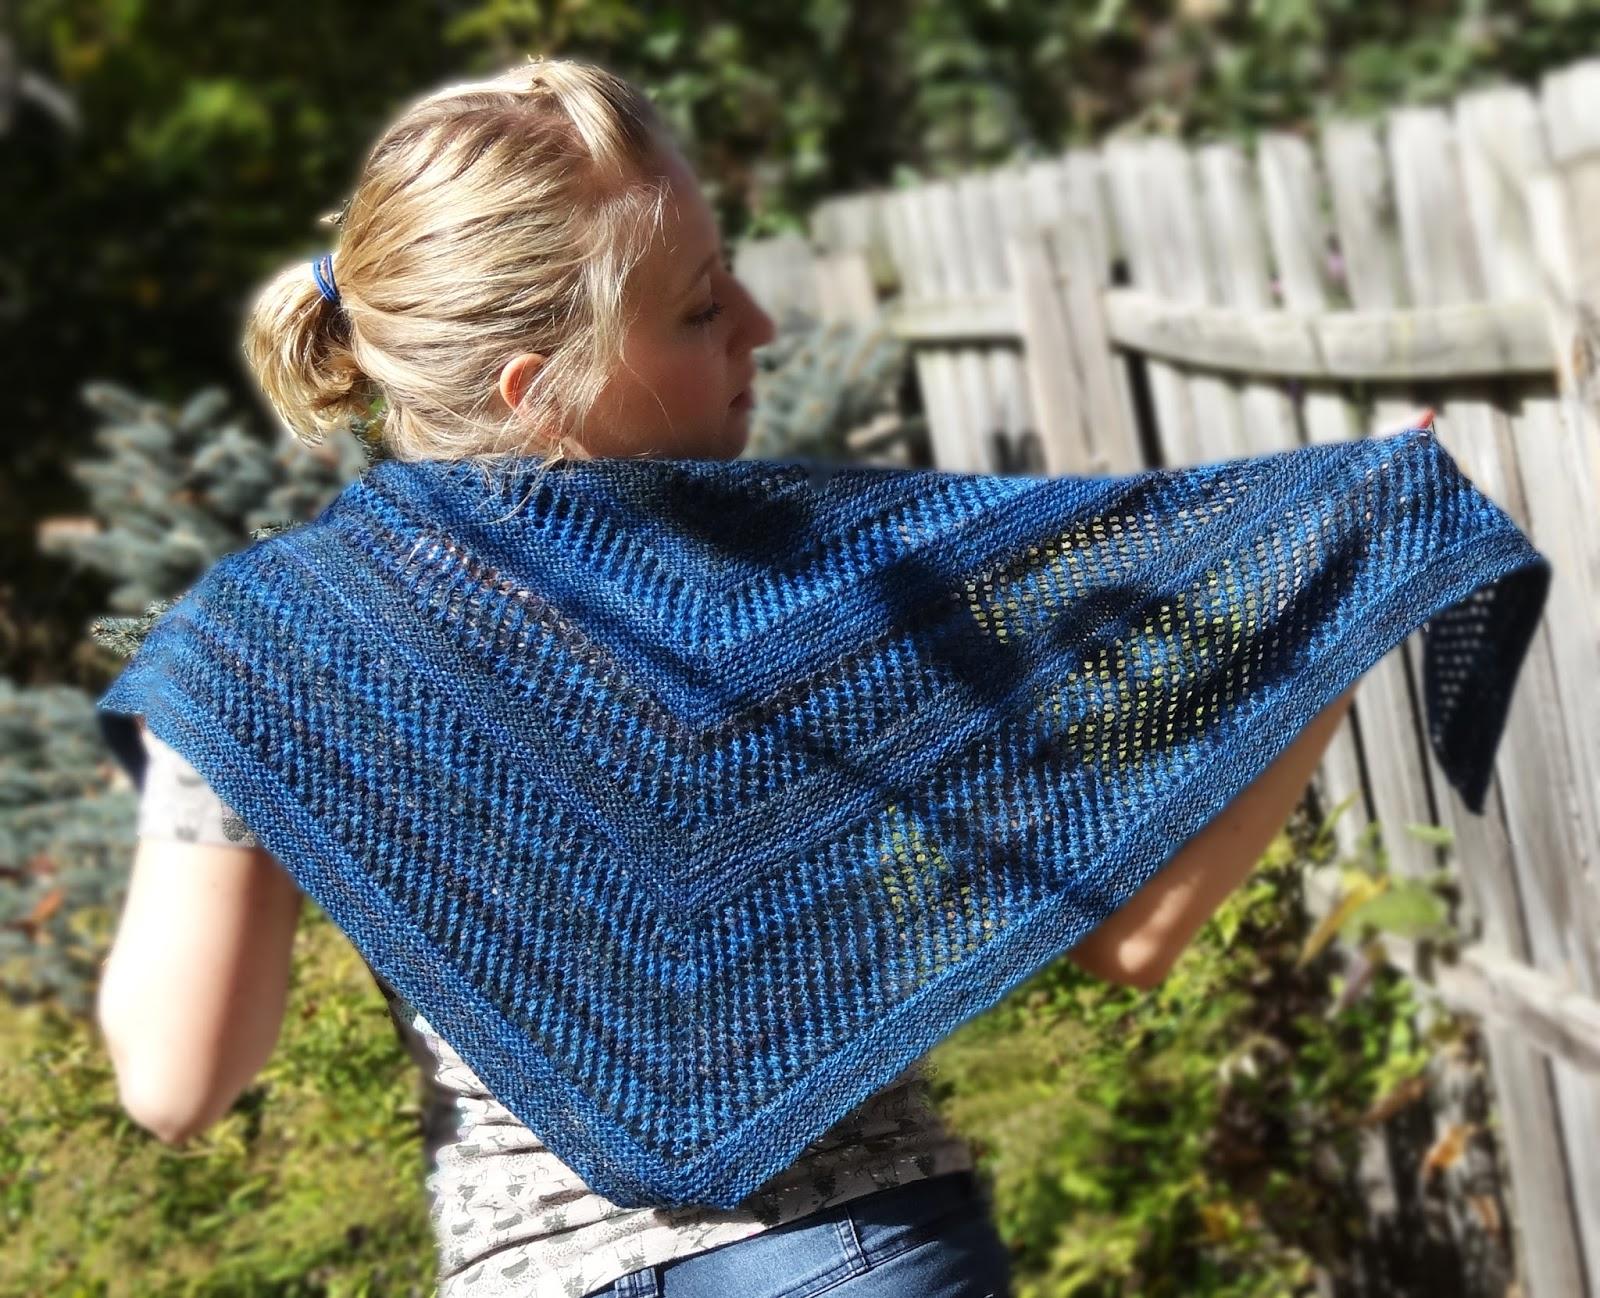 Knitting Up A Storm: Reyna Shawl